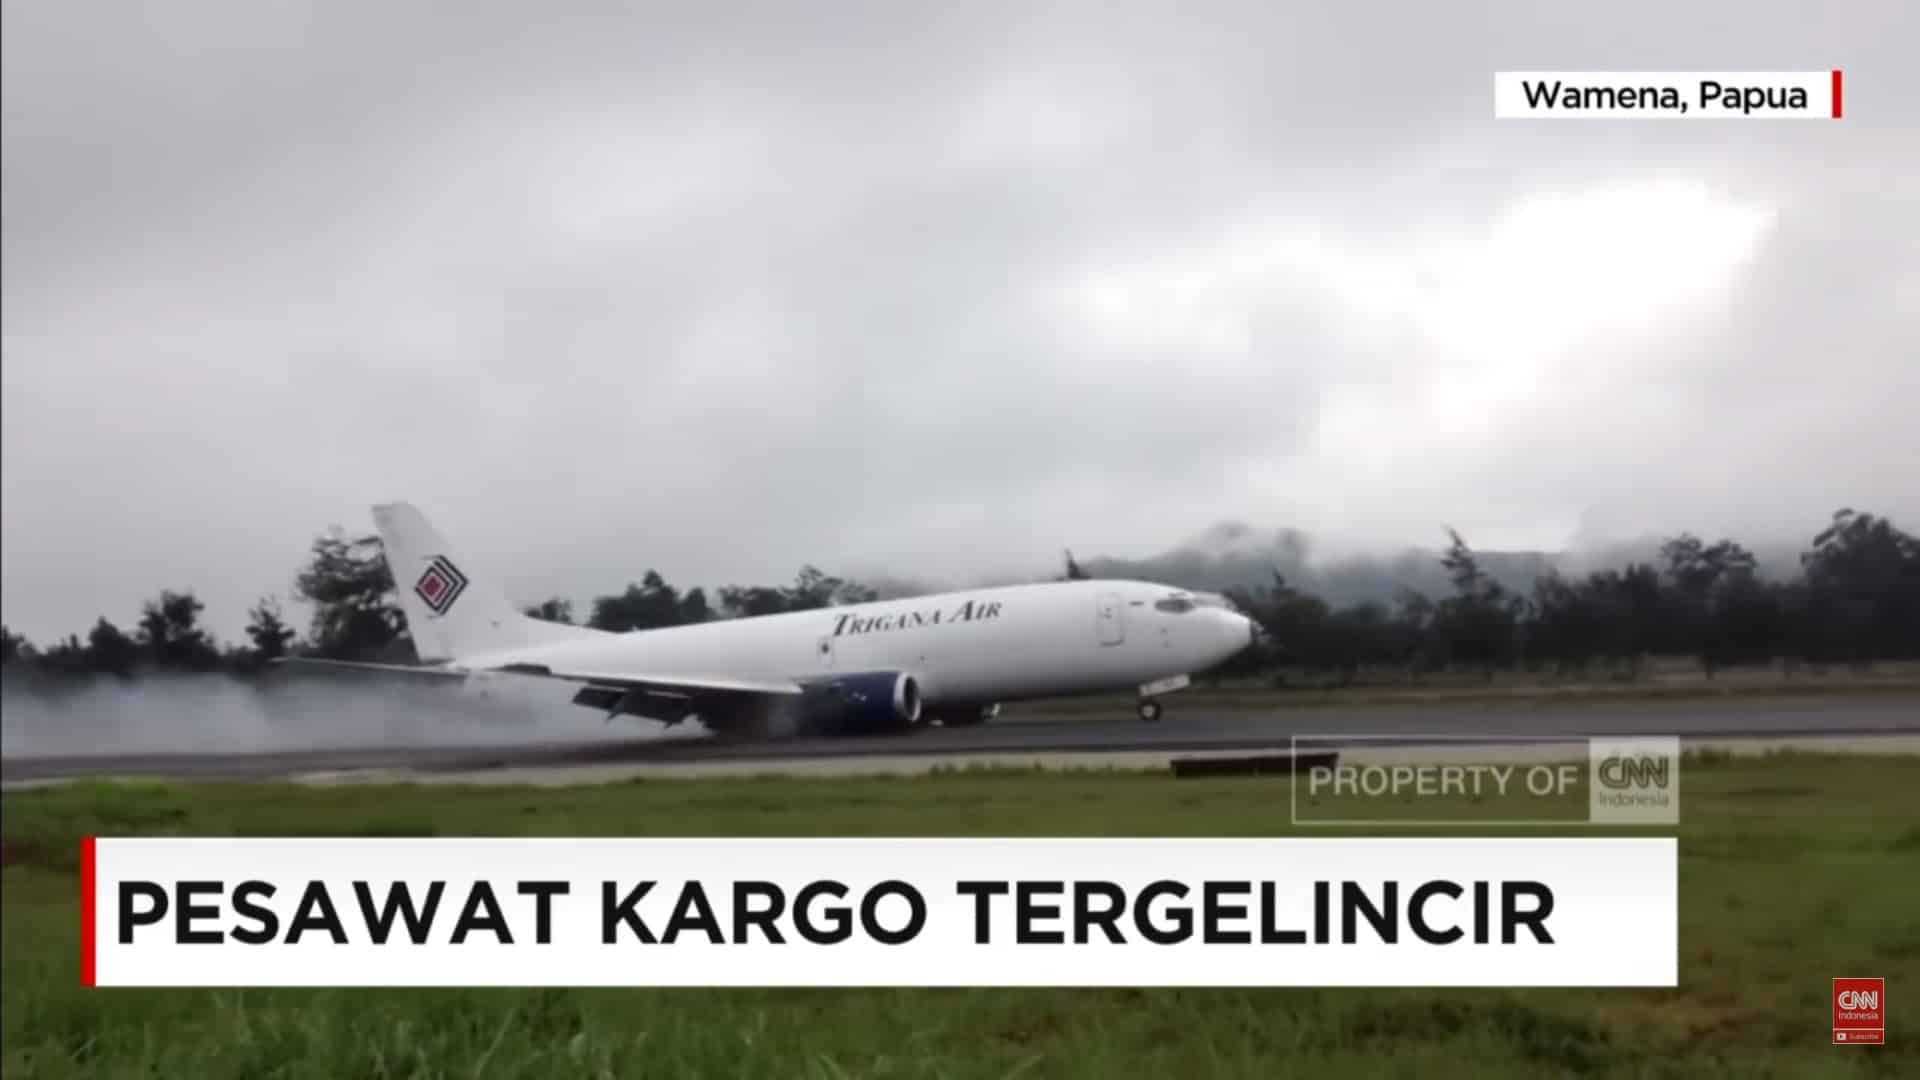 aterizare-pe-burta-boeing-737-300f